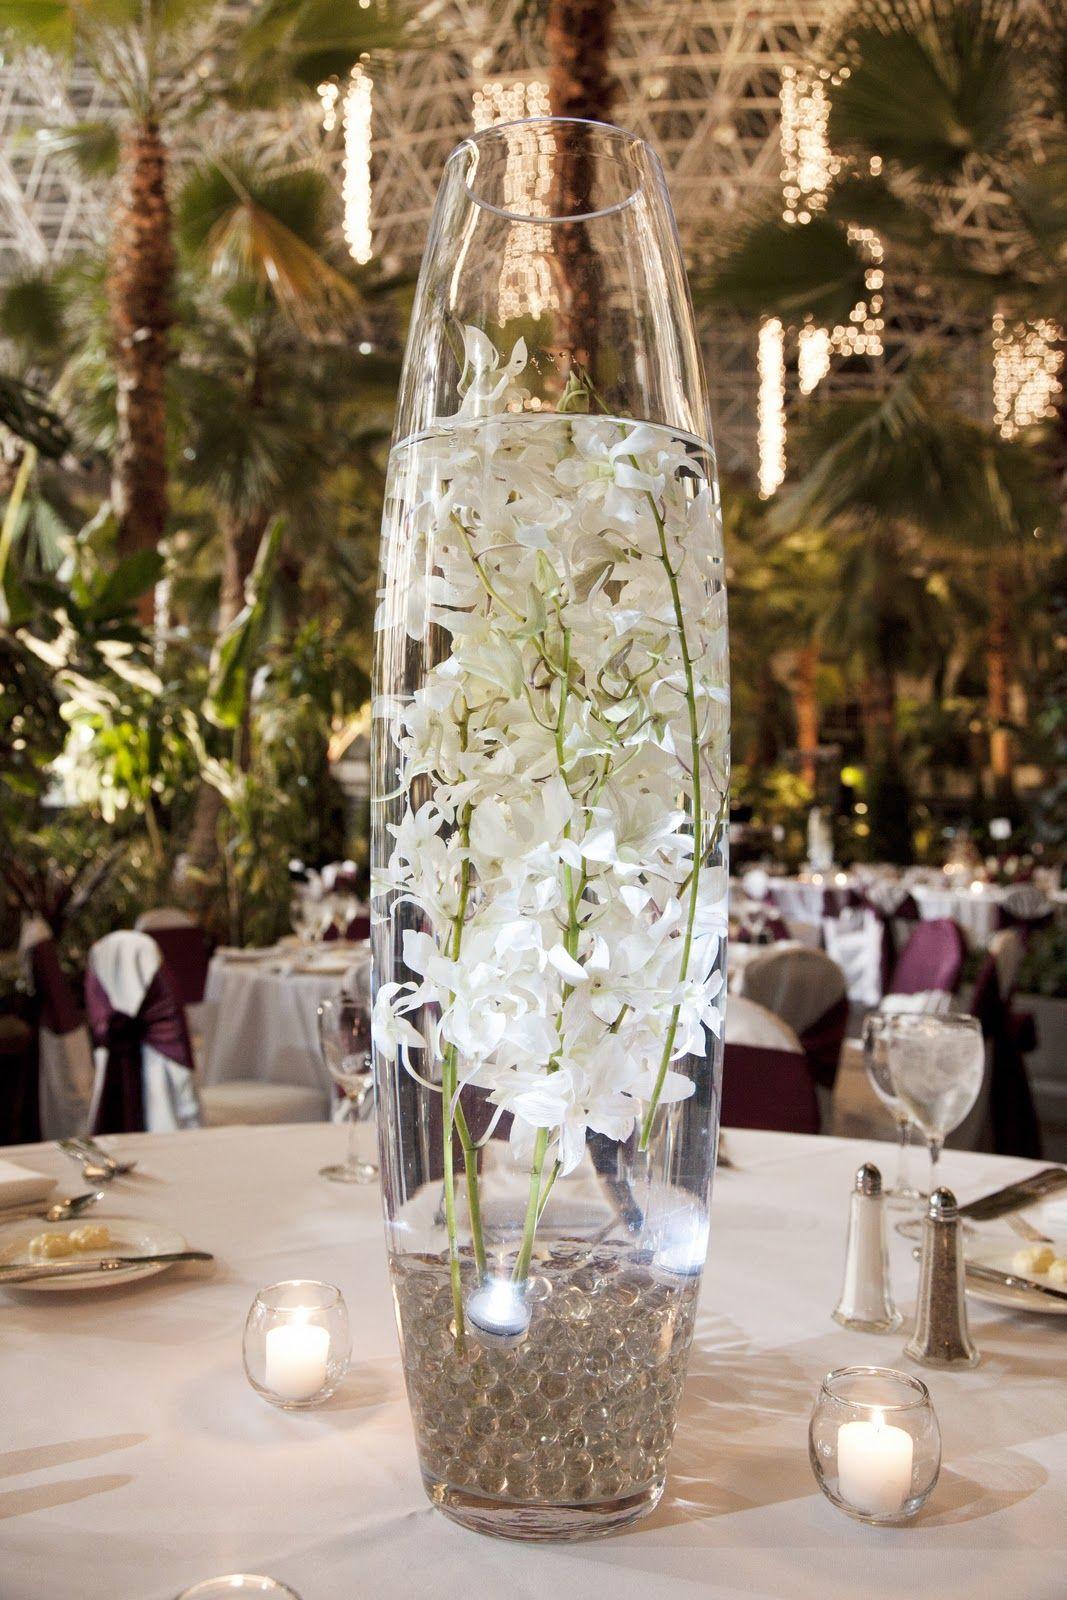 Flowerless Centerpieces Aberdeens Wedding Florist Created These